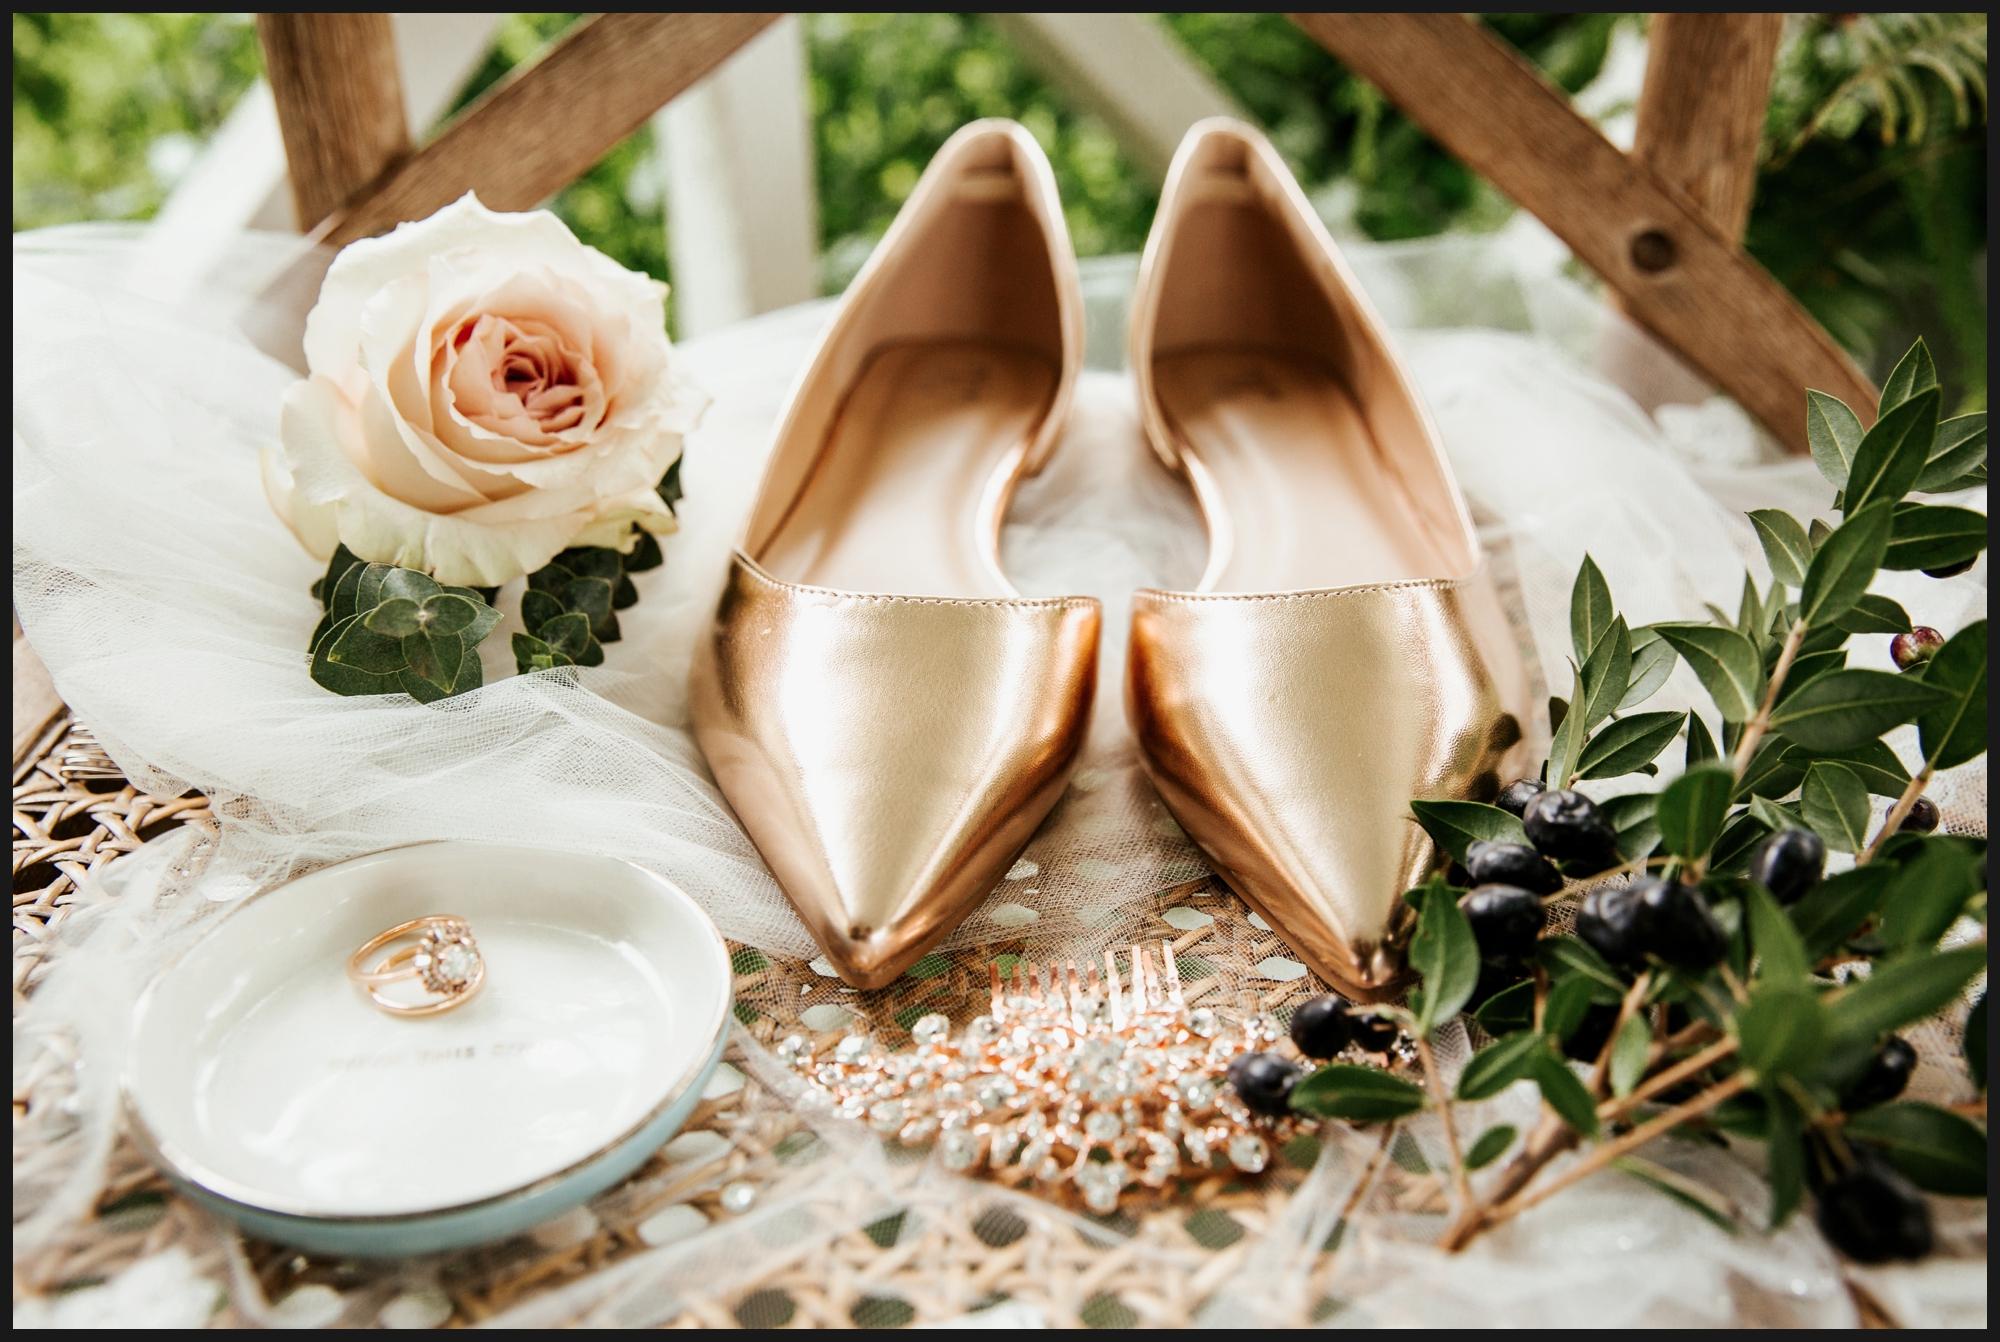 Orlando-Wedding-Photographer-destination-wedding-photographer-florida-wedding-photographer-hawaii-wedding-photographer_0489.jpg